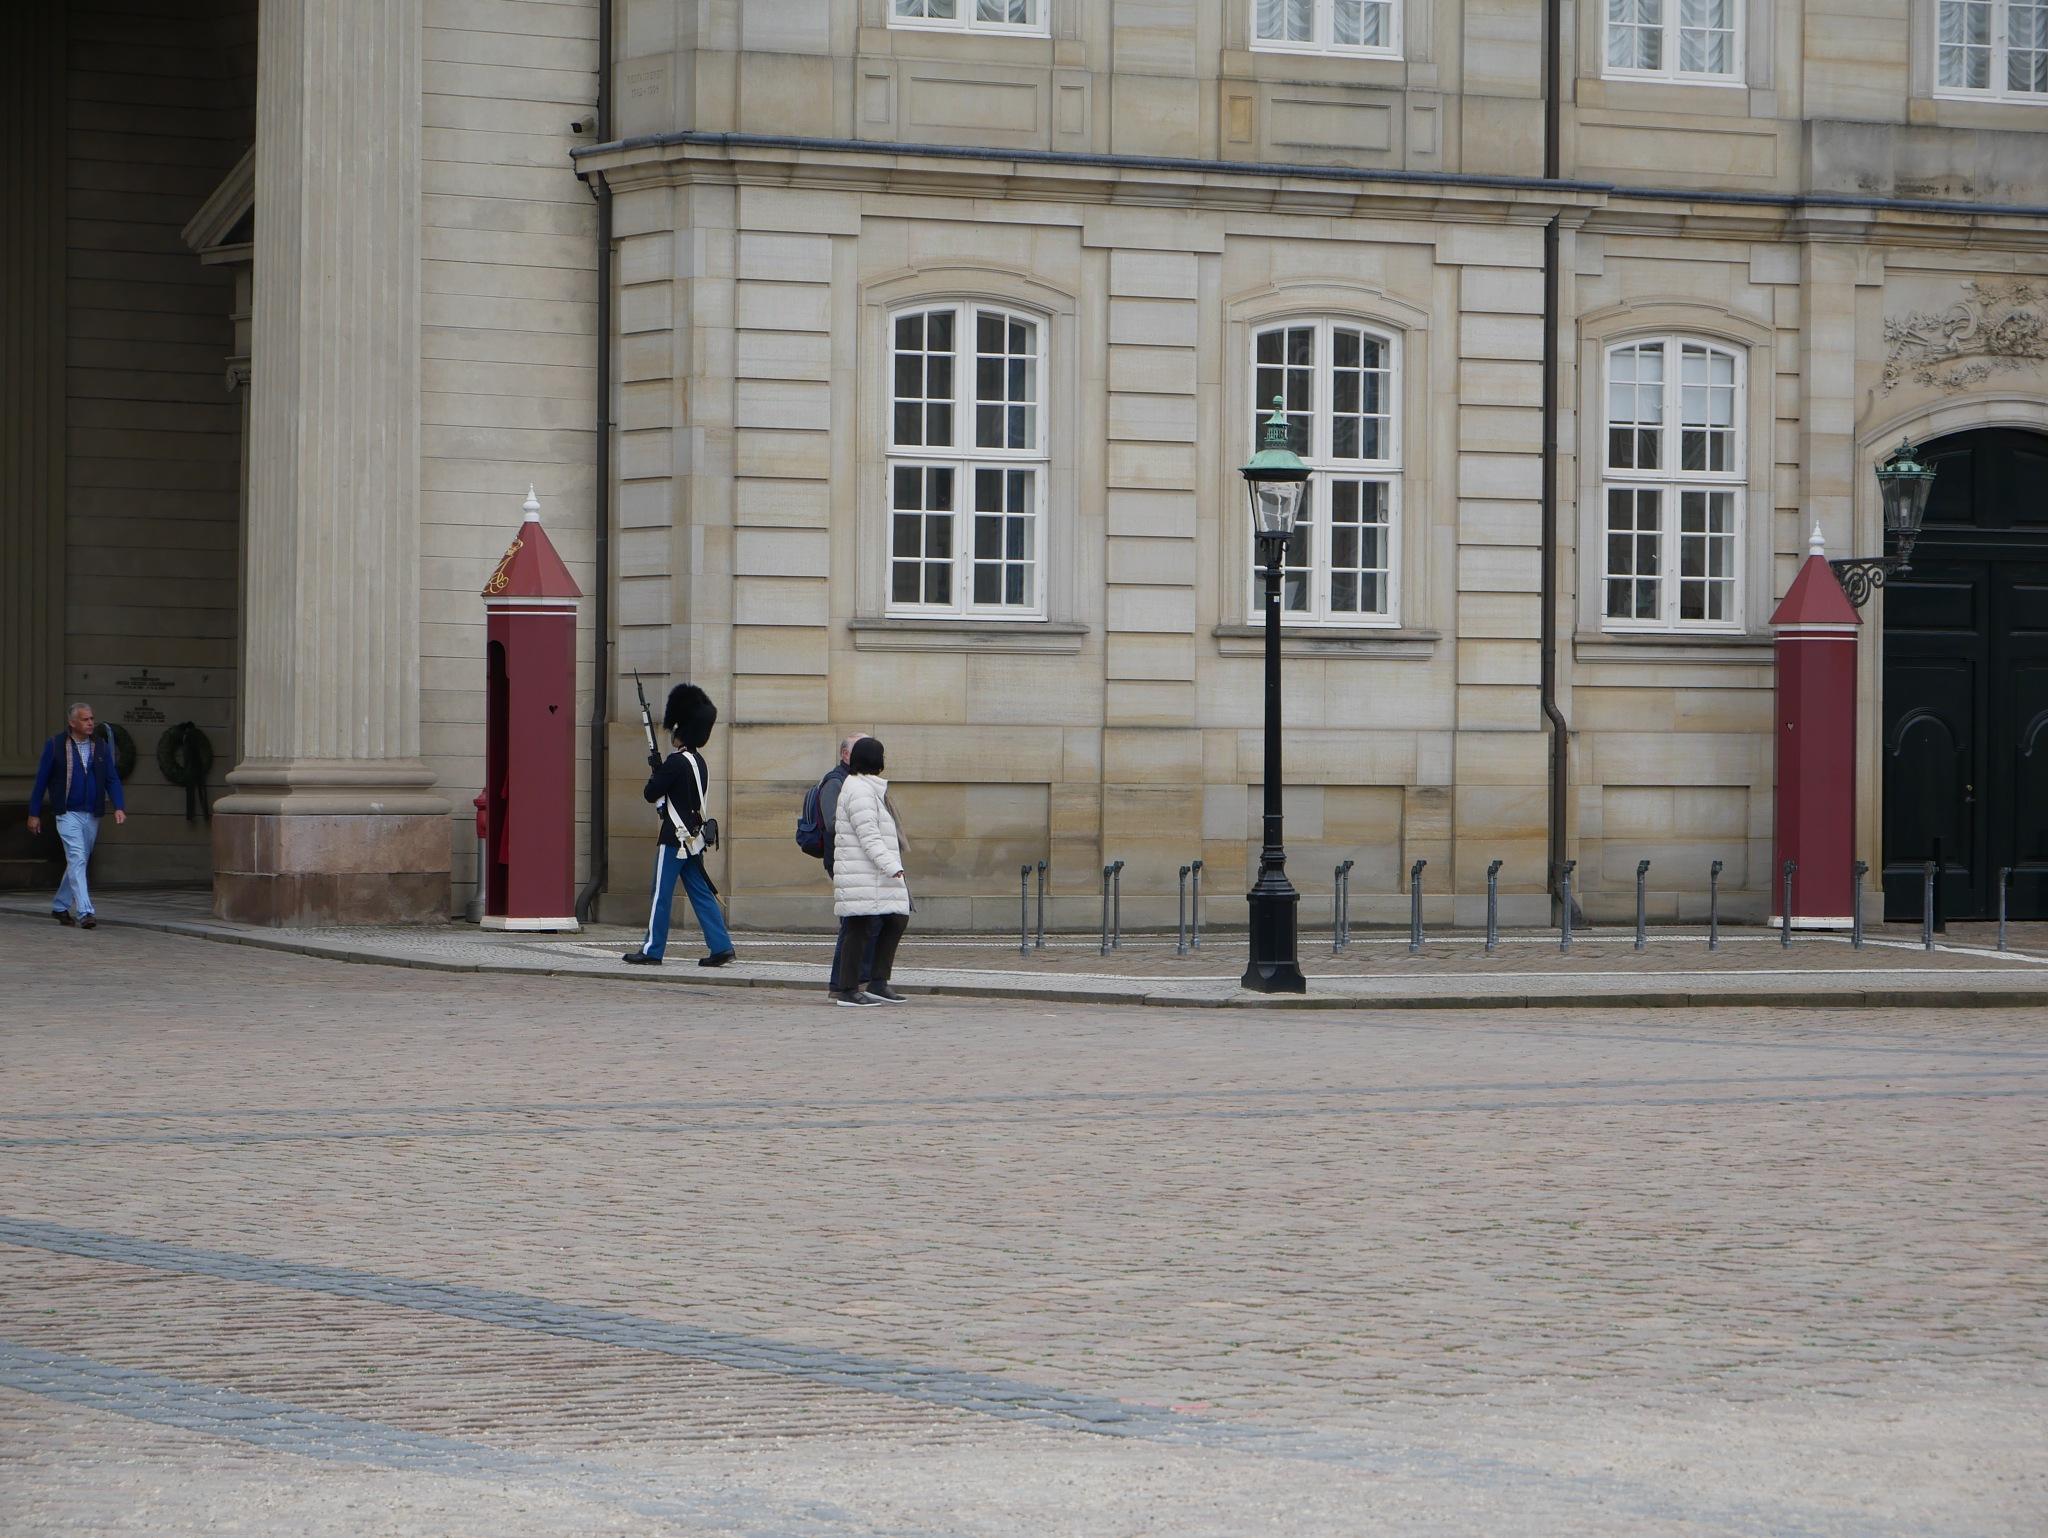 Guarding the Danish Queen's Palace in Copenhagen  by John Chilver